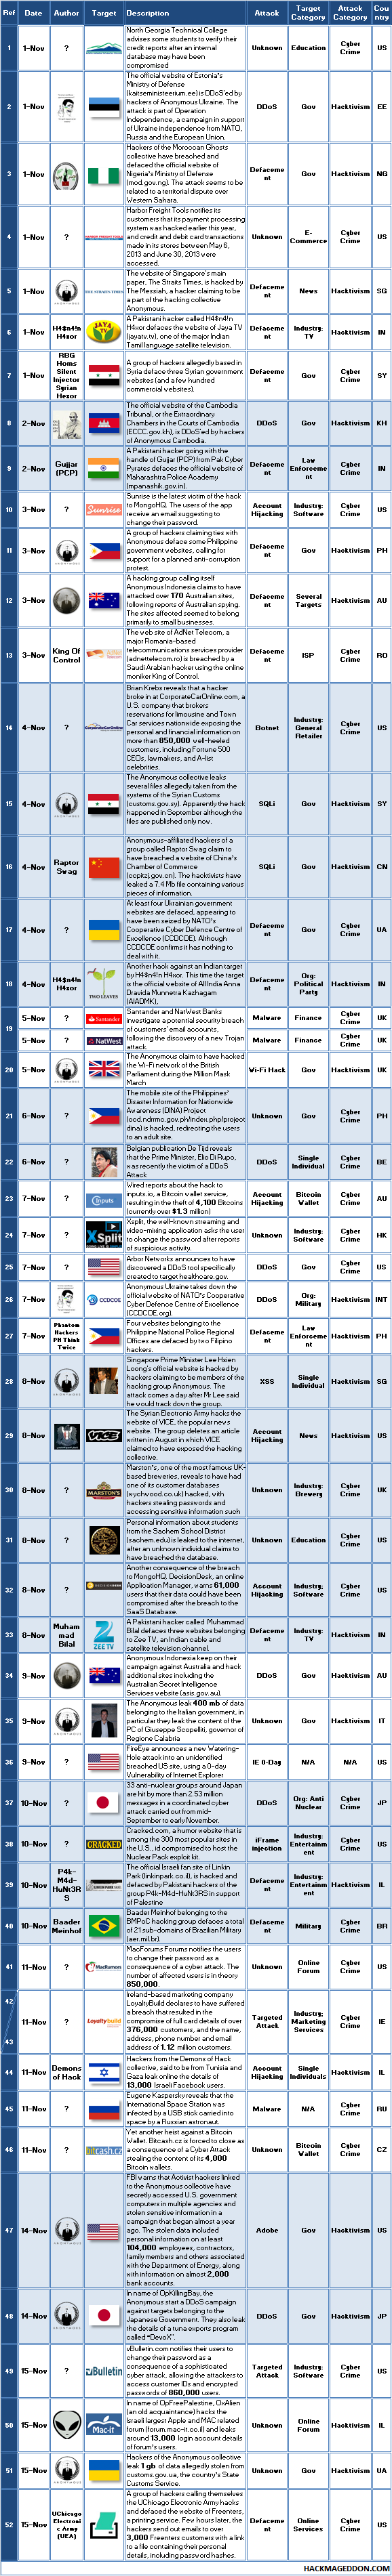 1-15 November 2013 Cyber Attacks Timeline